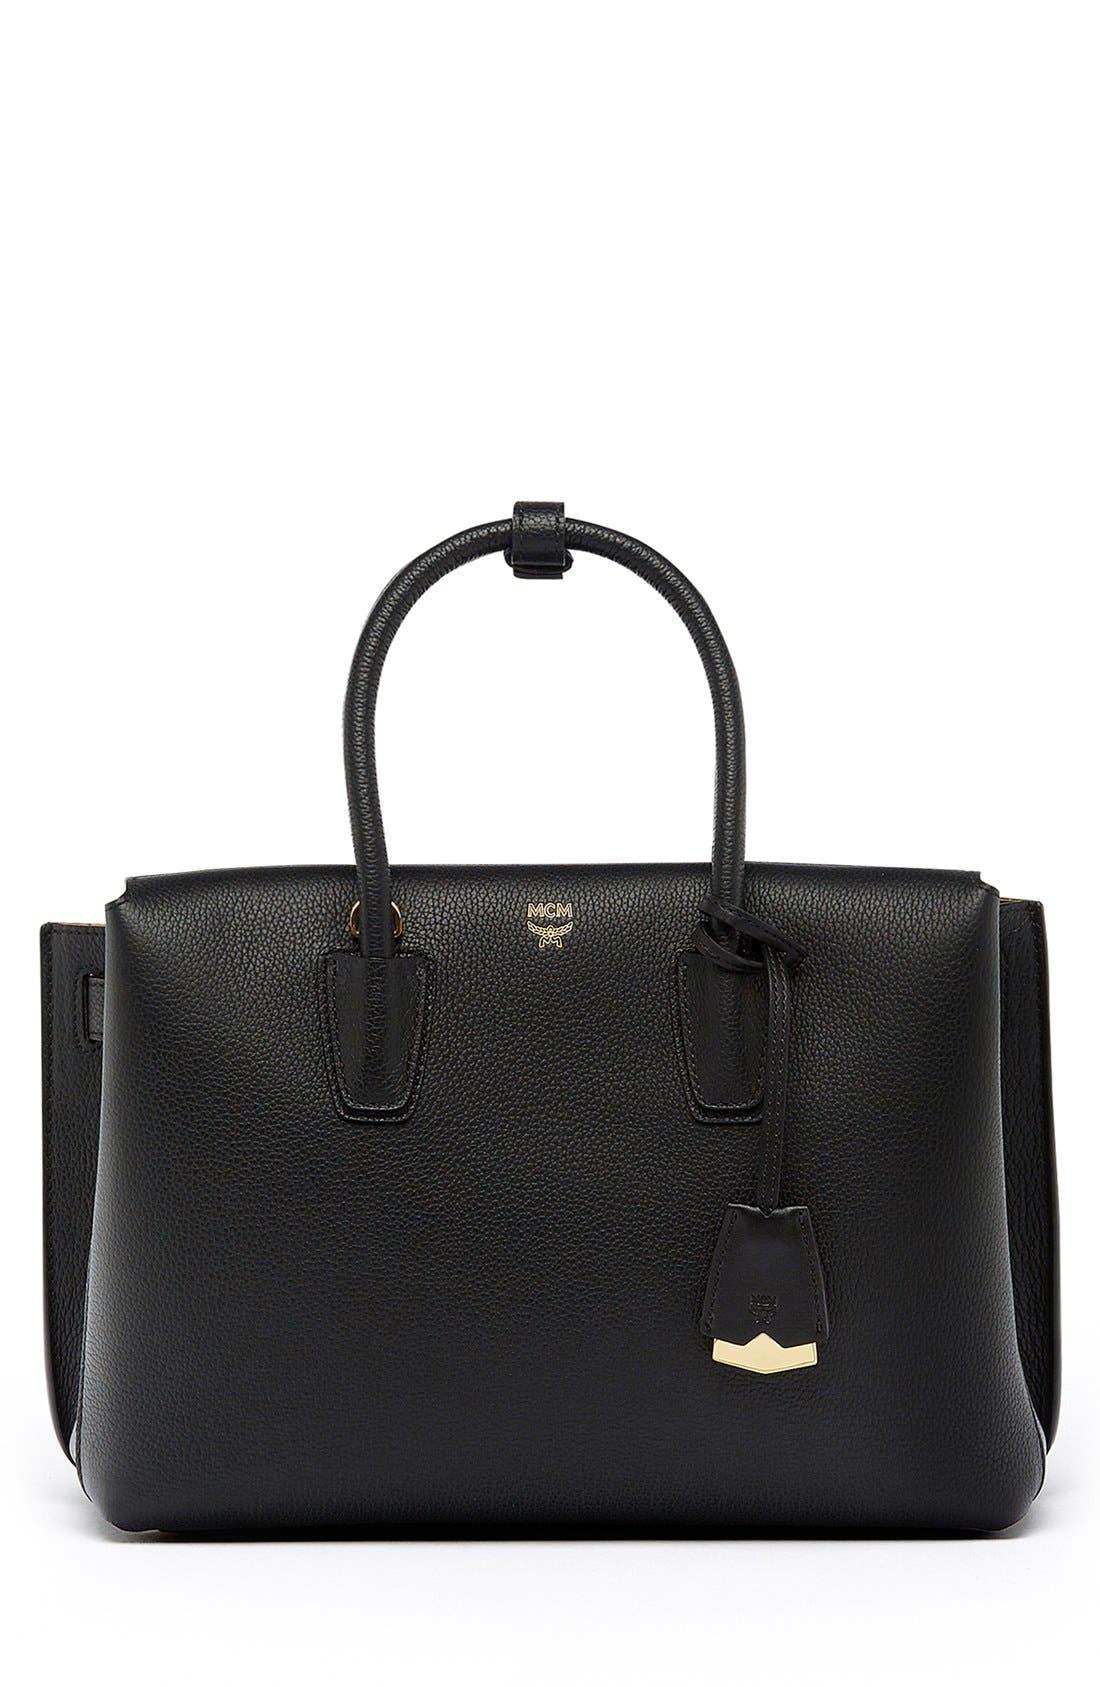 Medium Milla Leather Tote,                         Main,                         color, BLACK